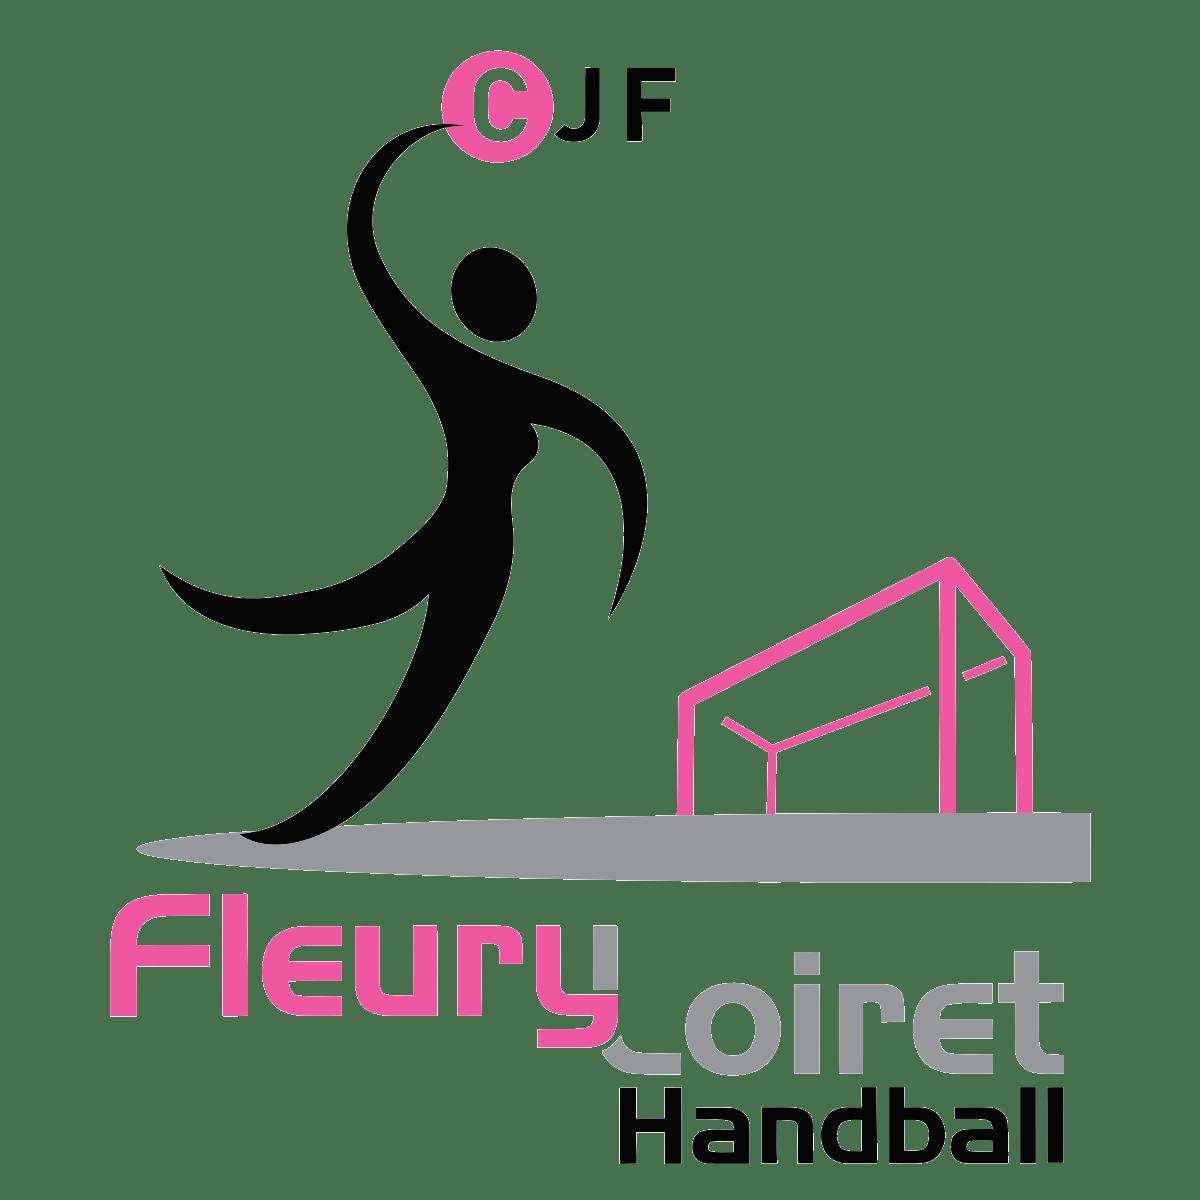 Challenge Fleury Loiret Handball